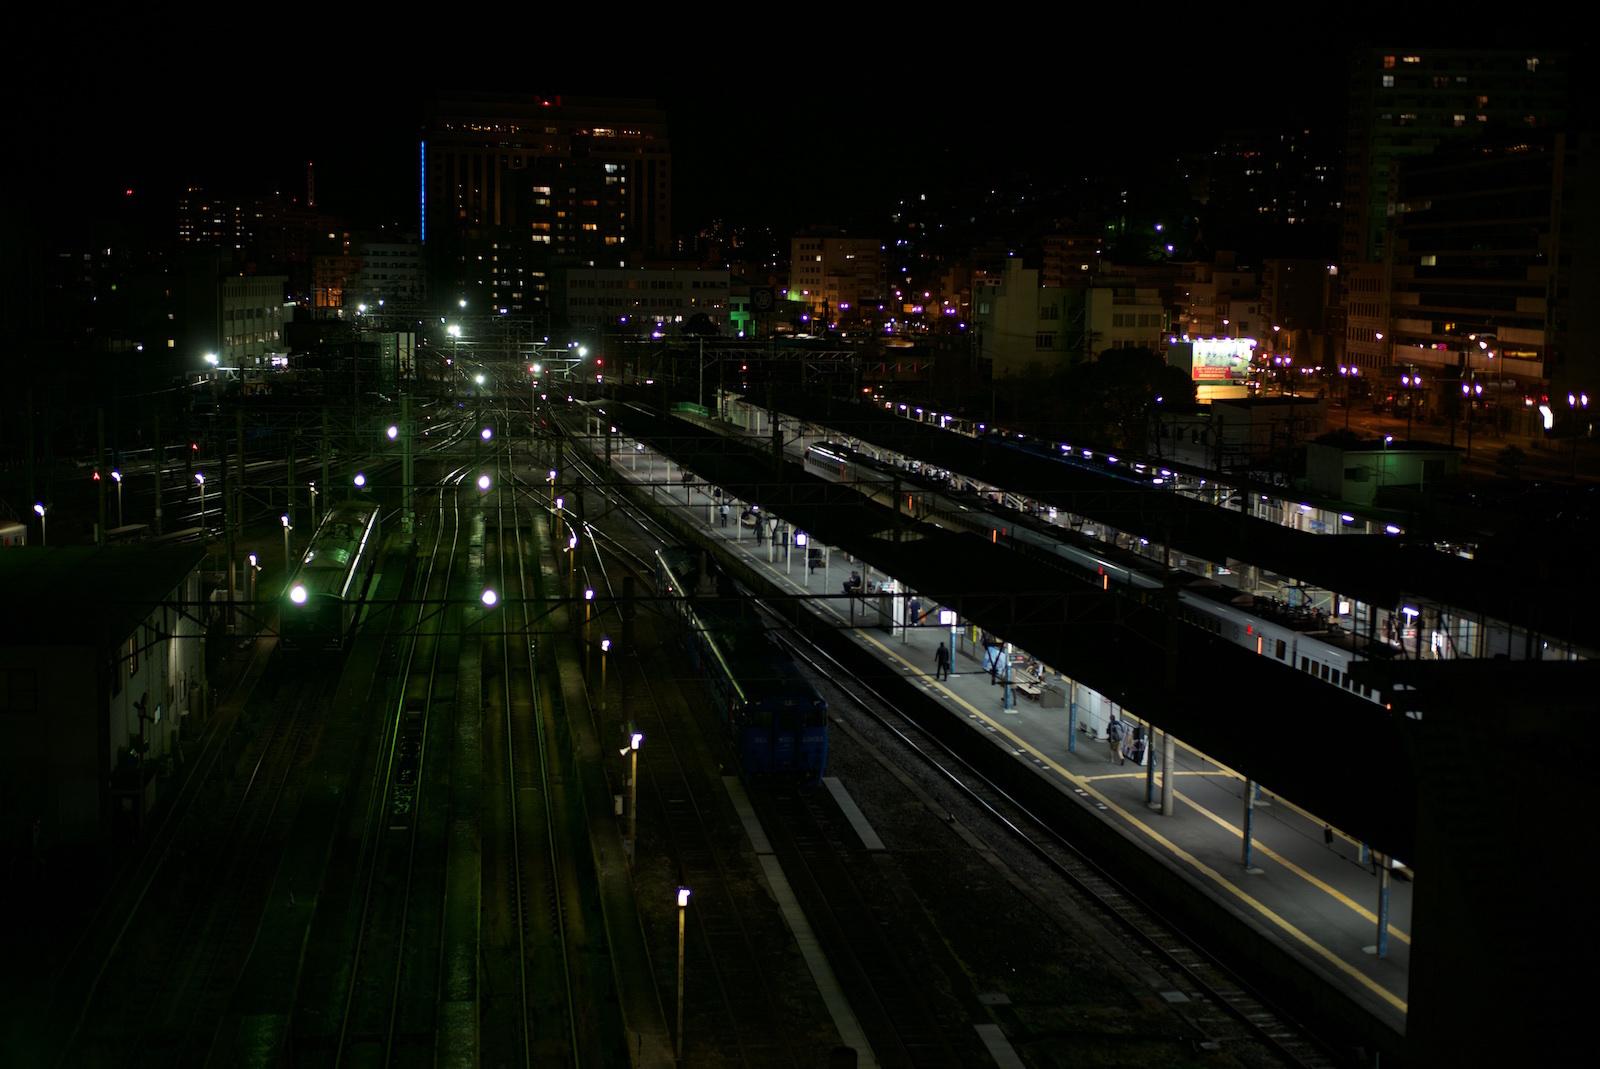 Platform_f0231512_11512712.jpg